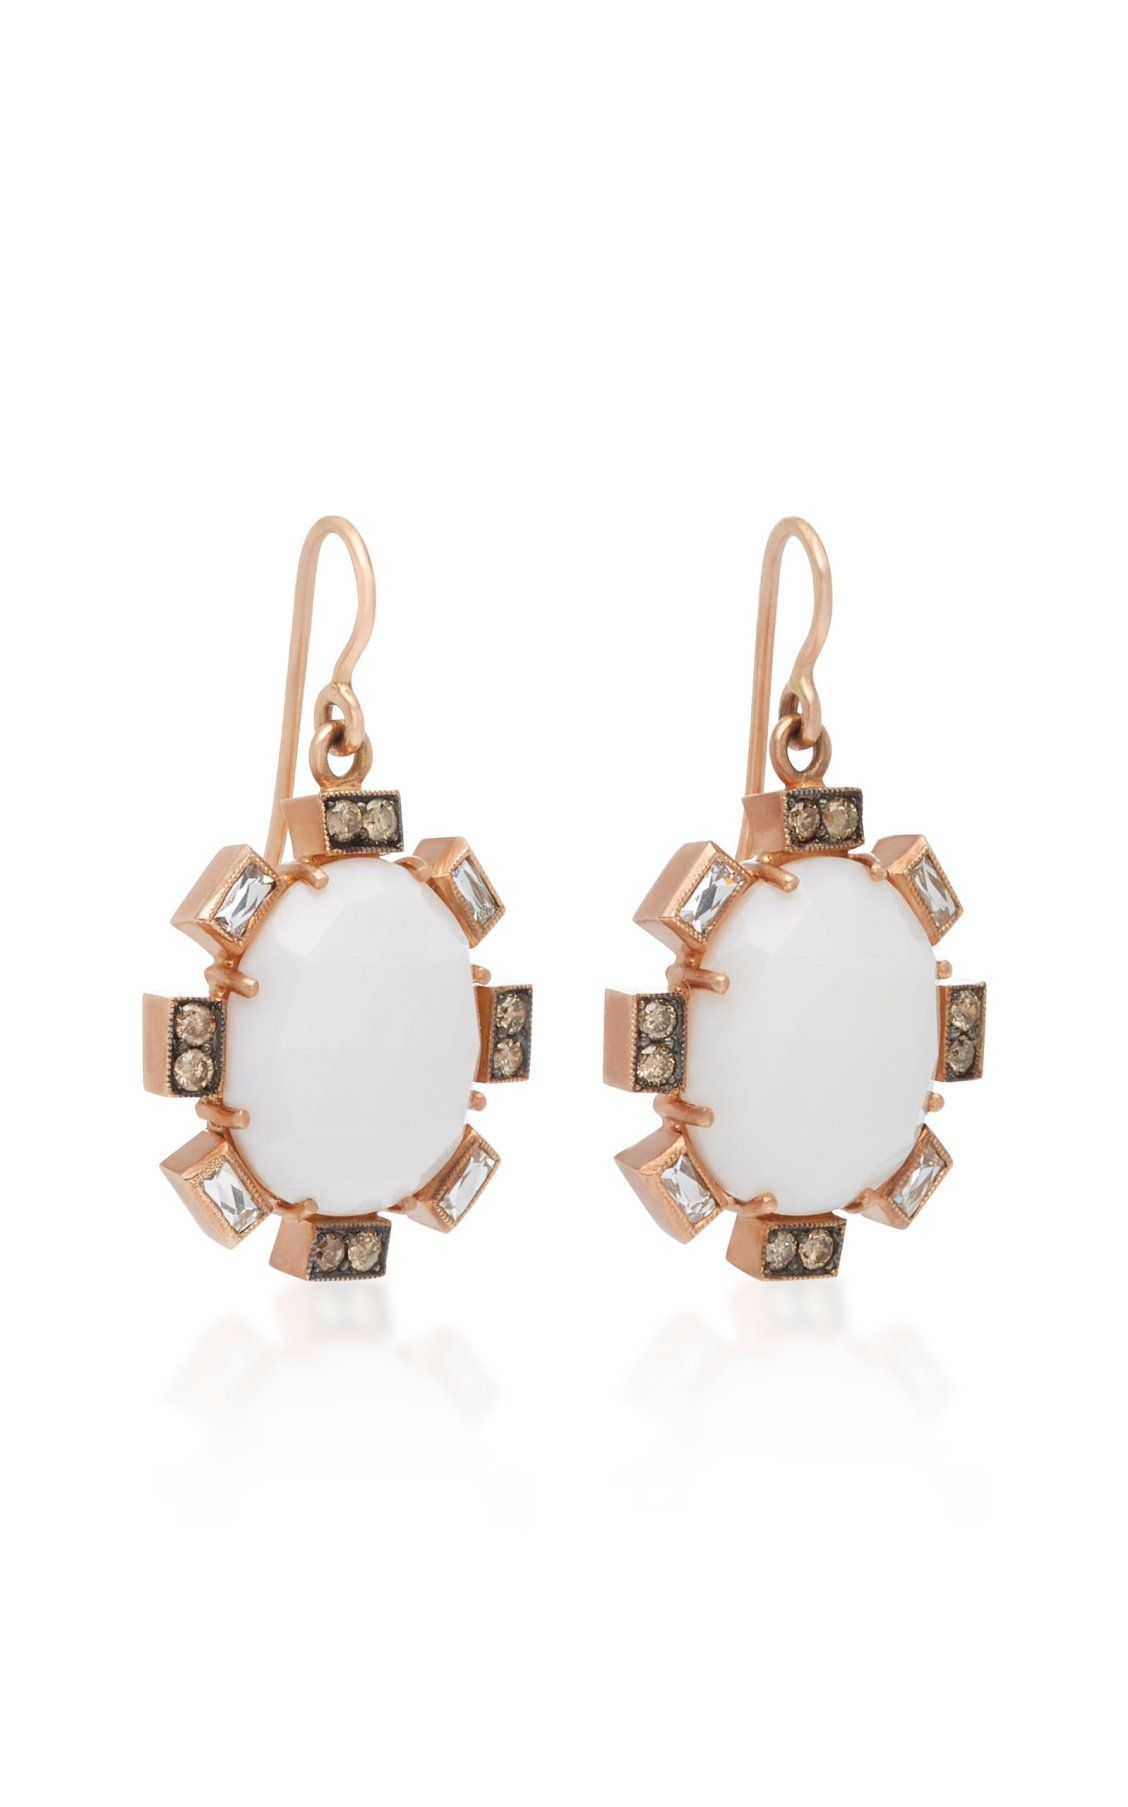 14K Rose Gold Cocholong and Diamond Earrings Sylva & Cie. DL8fTZB